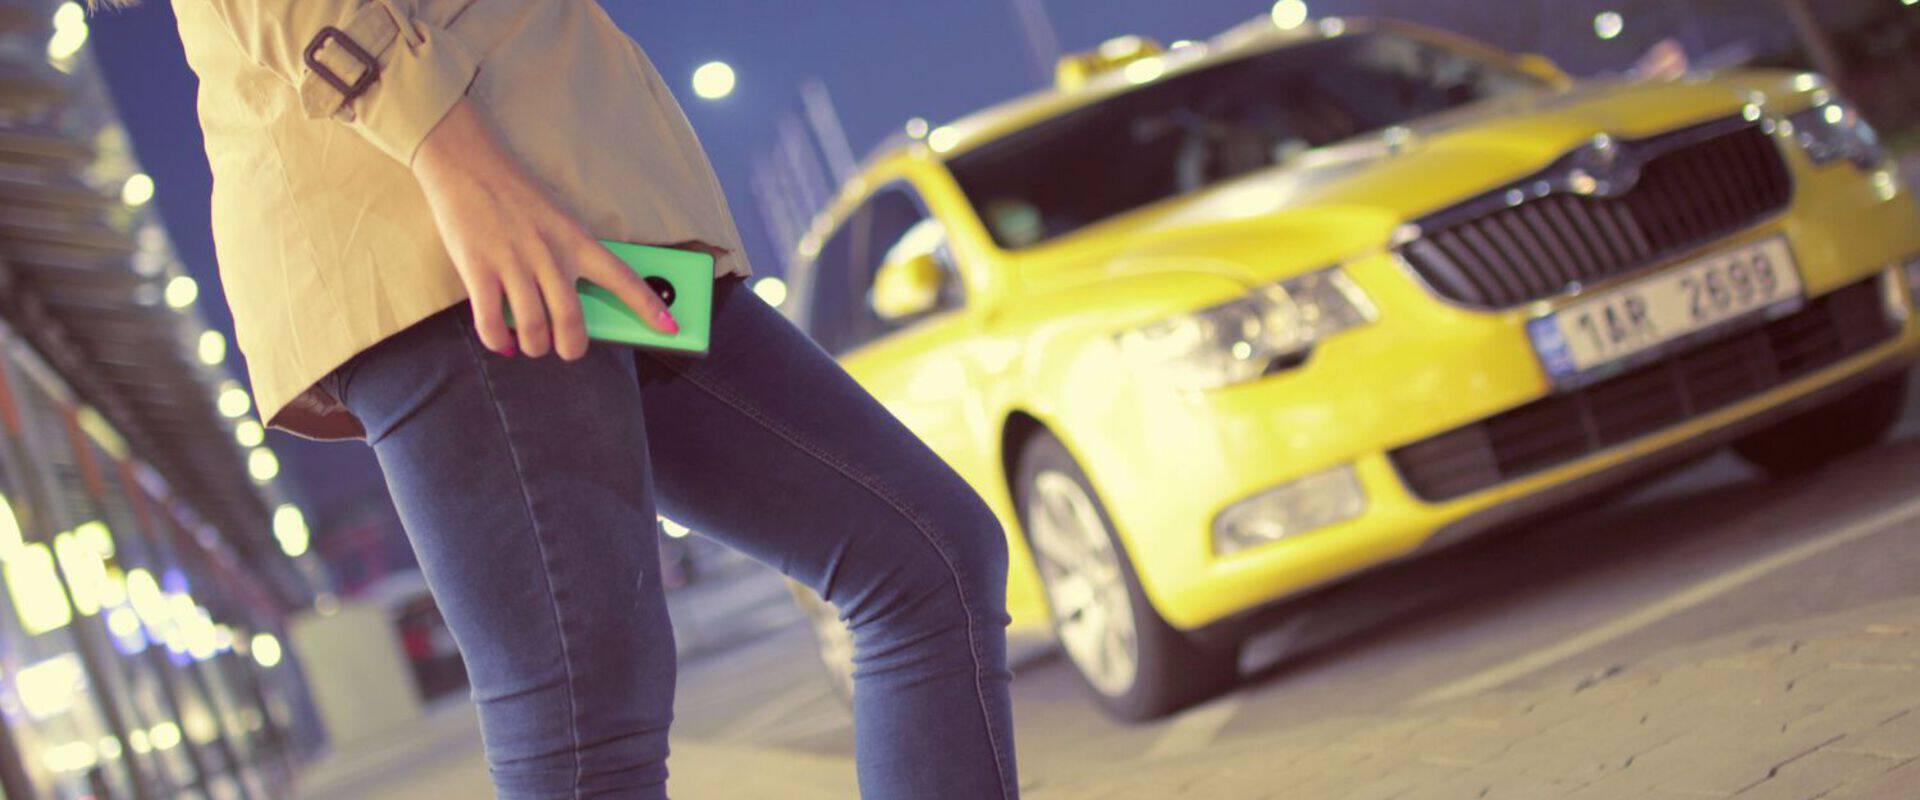 Judge OKs Lawsuit Over Uber Price Fixing Scheme